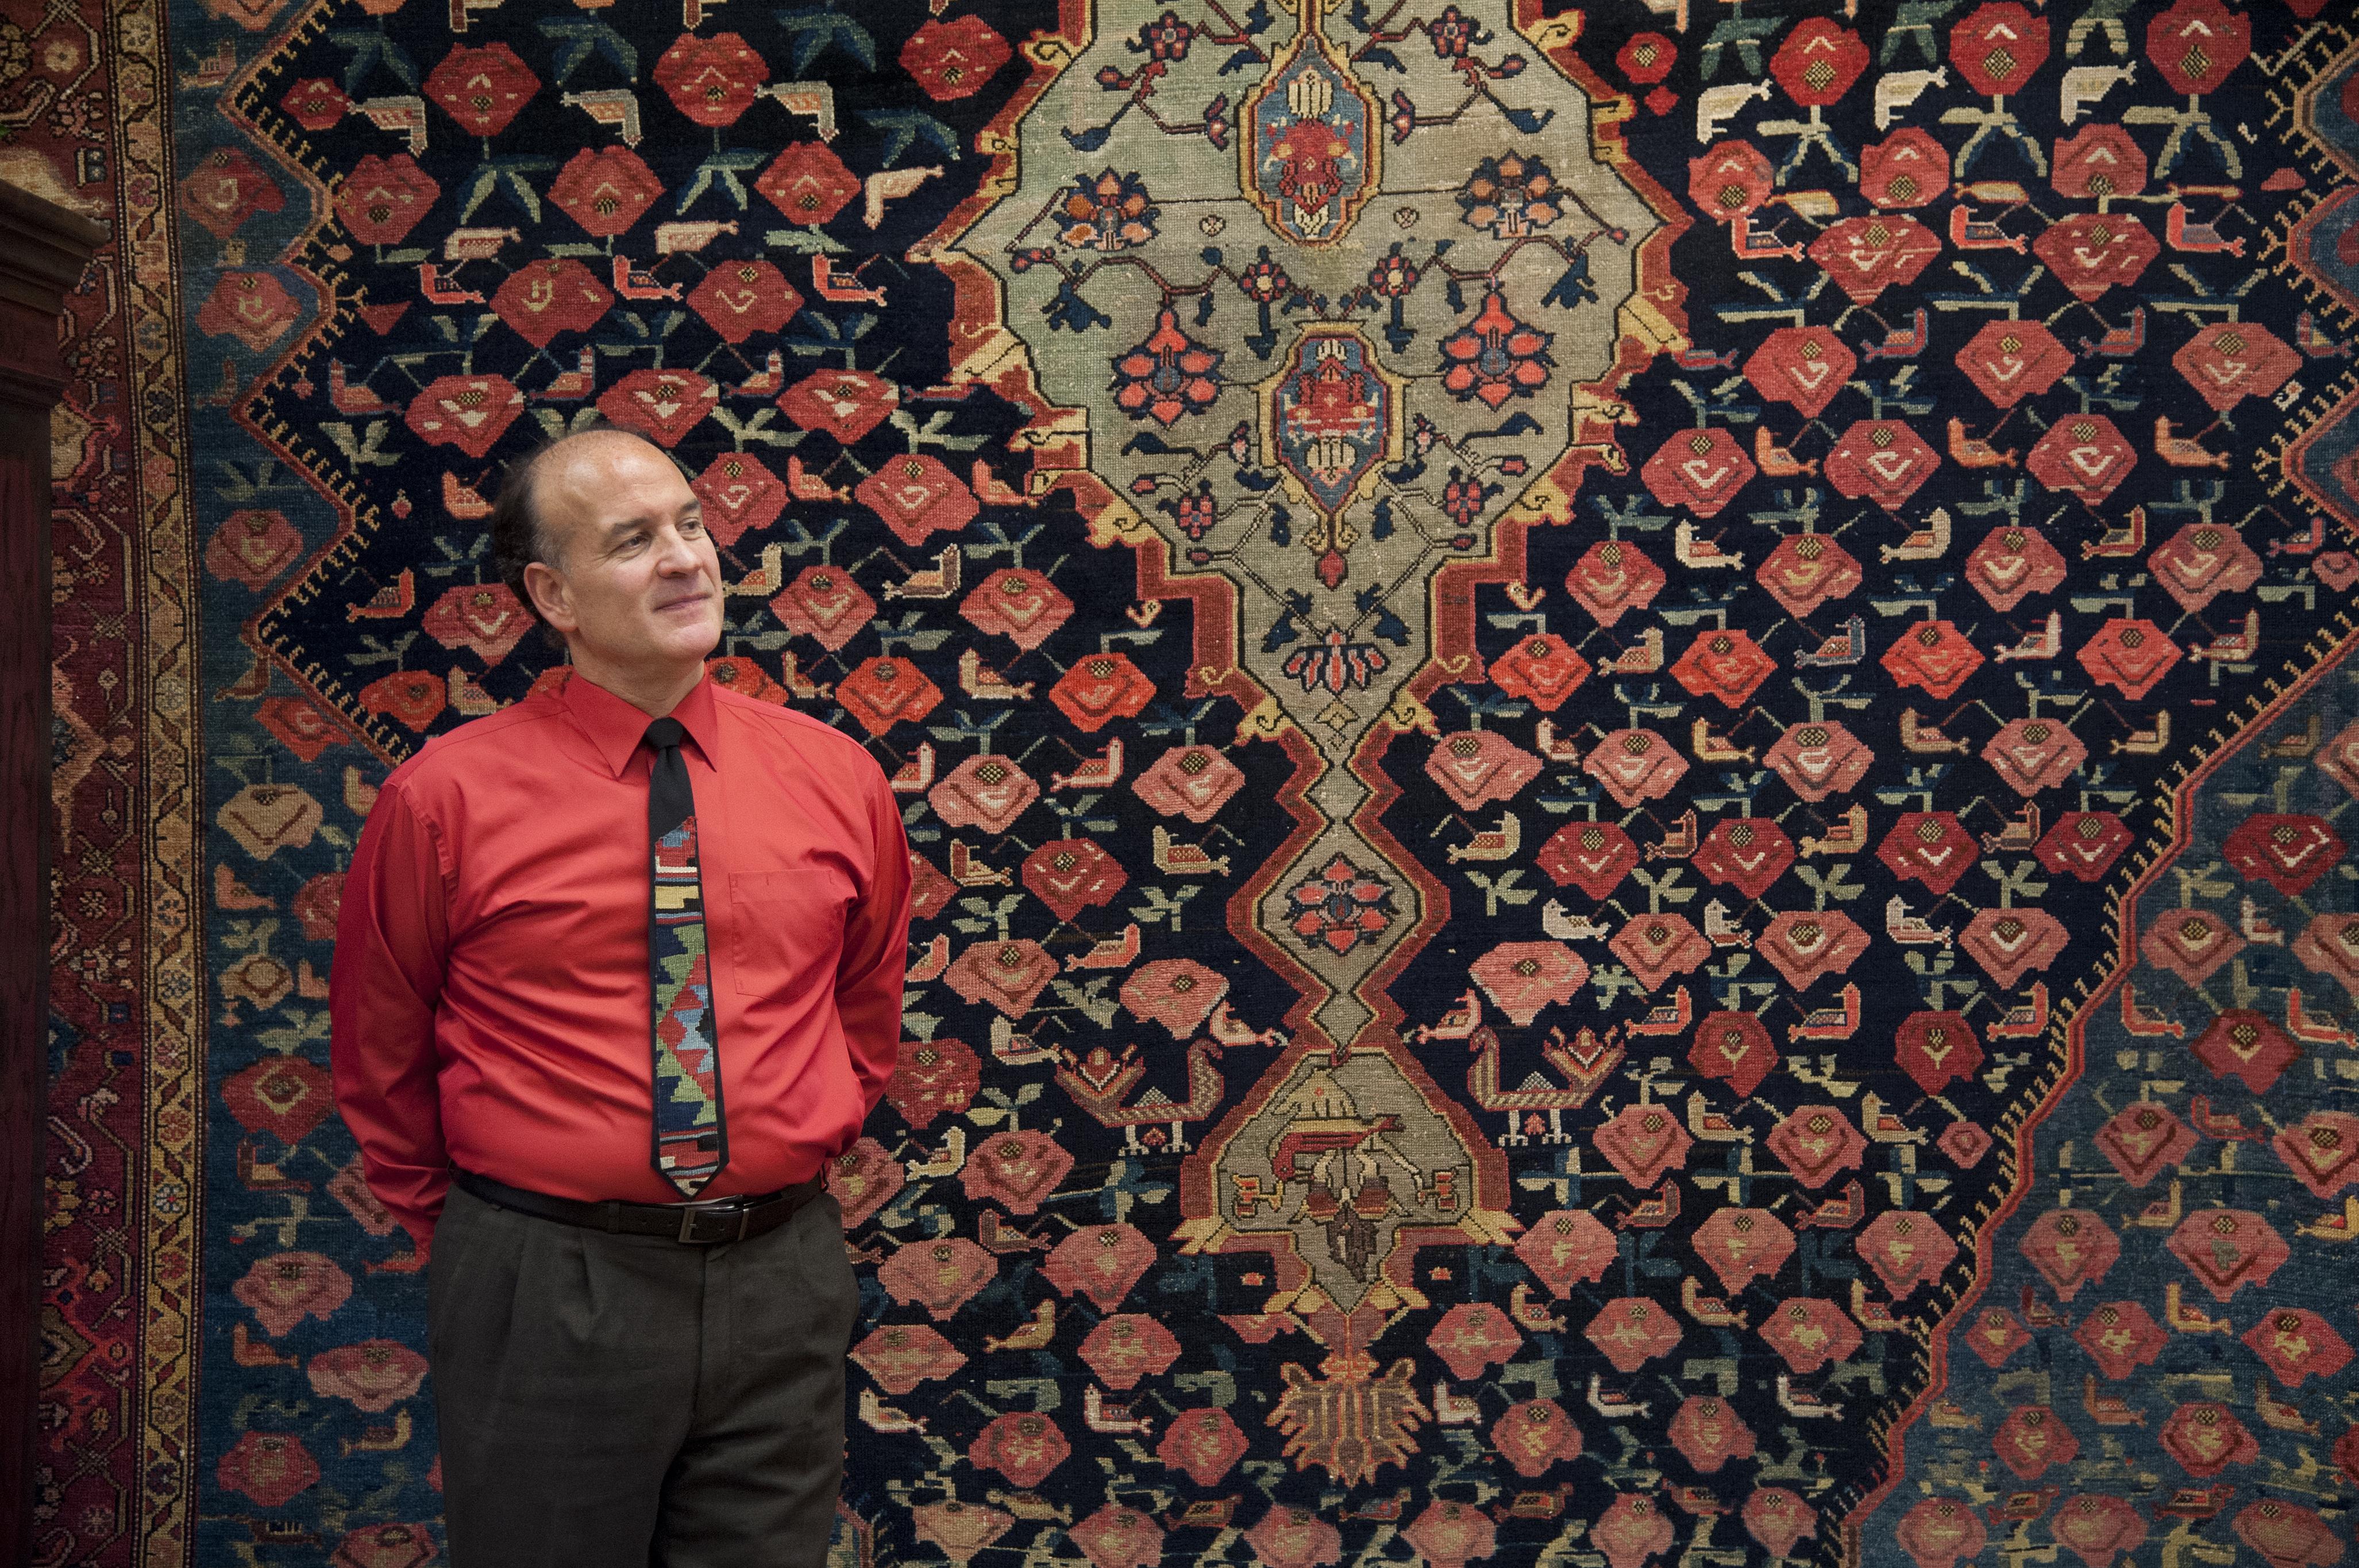 Oriental Rug Business Remains Staple Among Spokane